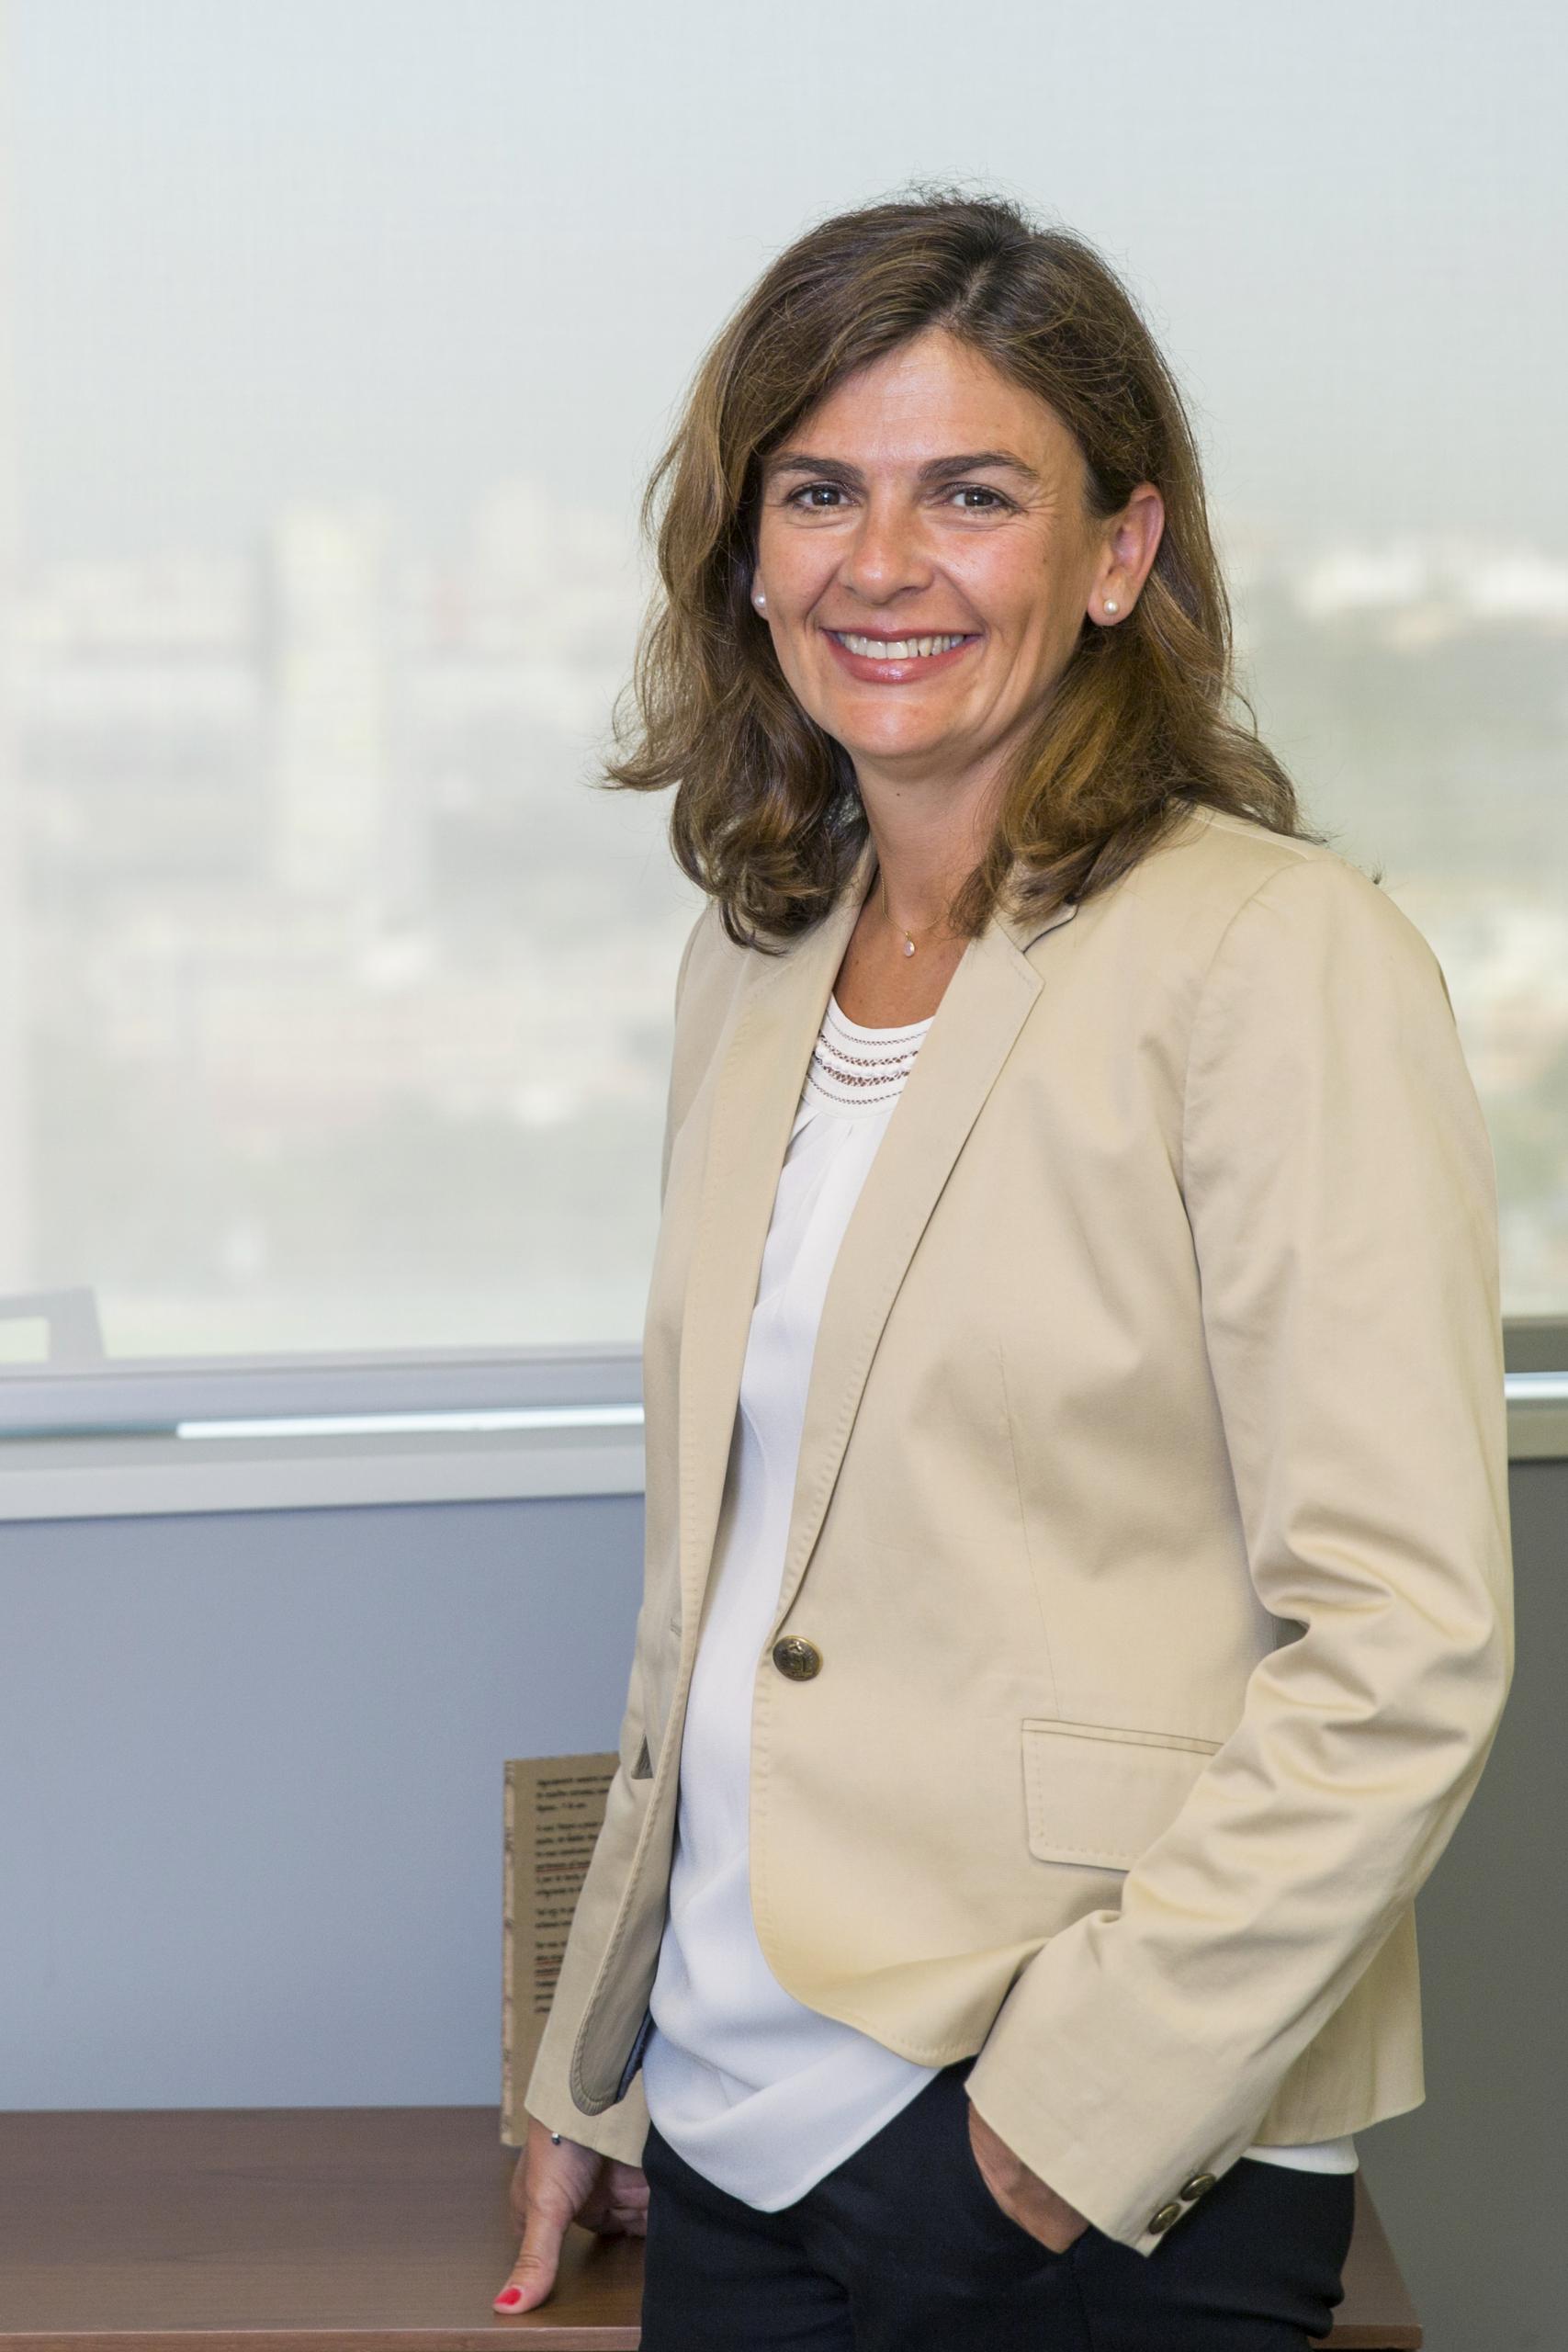 María Ruíz Manahan. Directora de Transformación